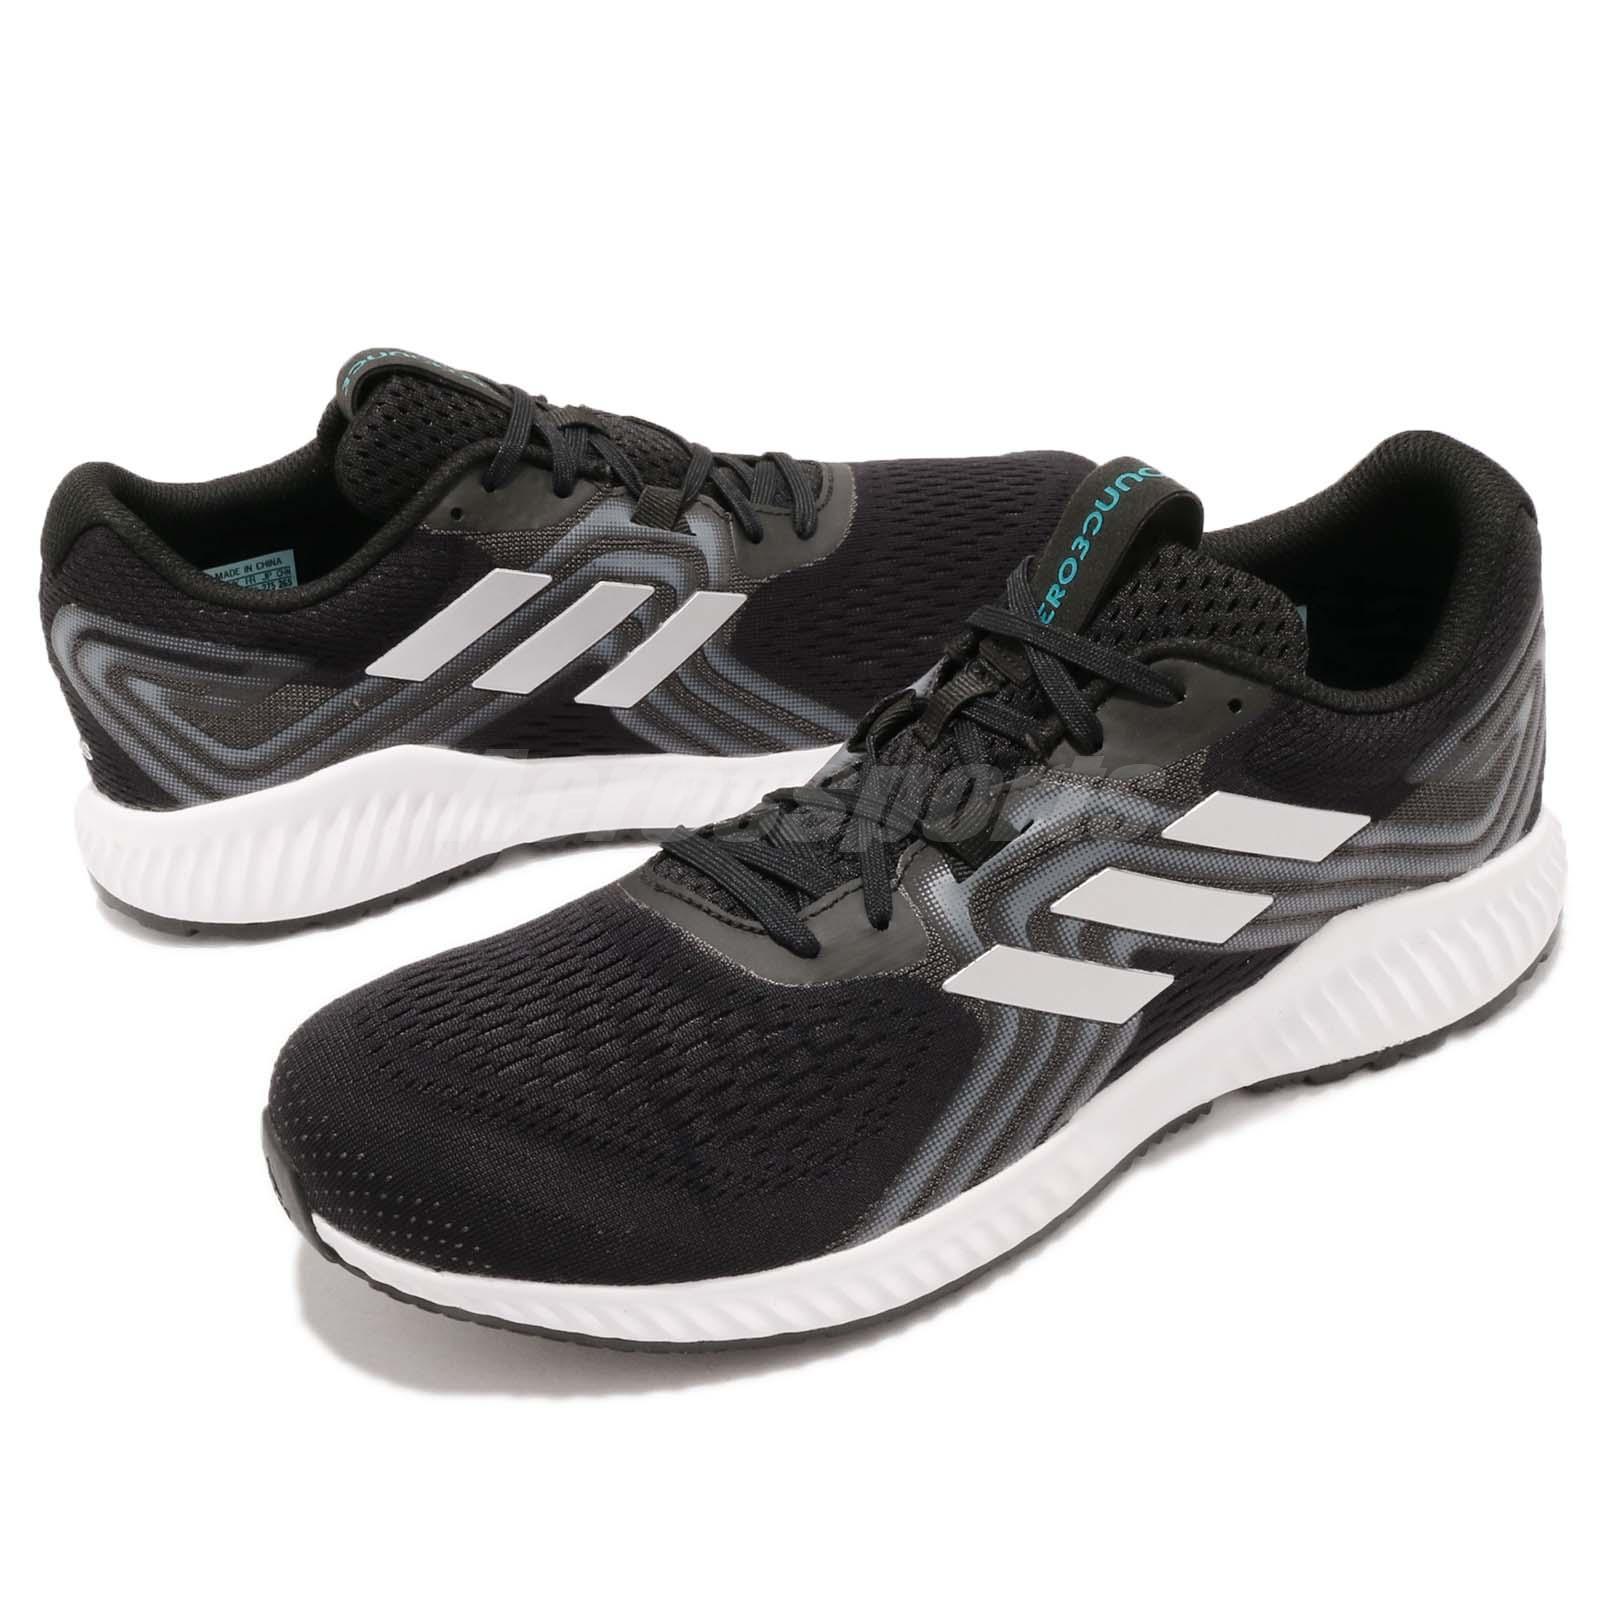 outlet store 87428 6e18c adidas Aerobounce 2 M Black Silver Aqua White Men Running Shoes ...